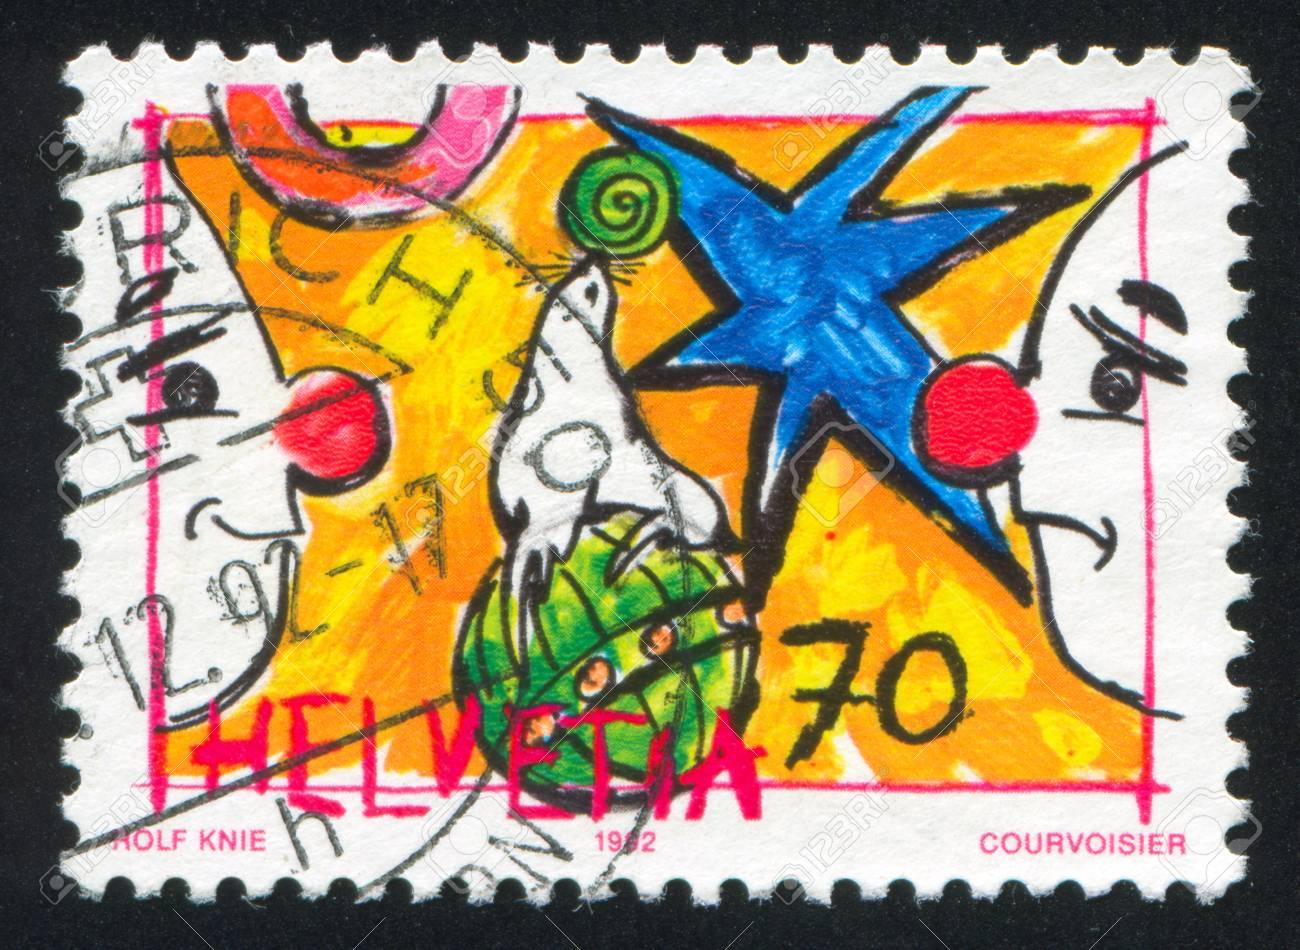 SWITZERLAND - CIRCA 1992: stamp printed by Switzerland, shows Sea lion and clowns, circa 1992 Stock Photo - 17837732